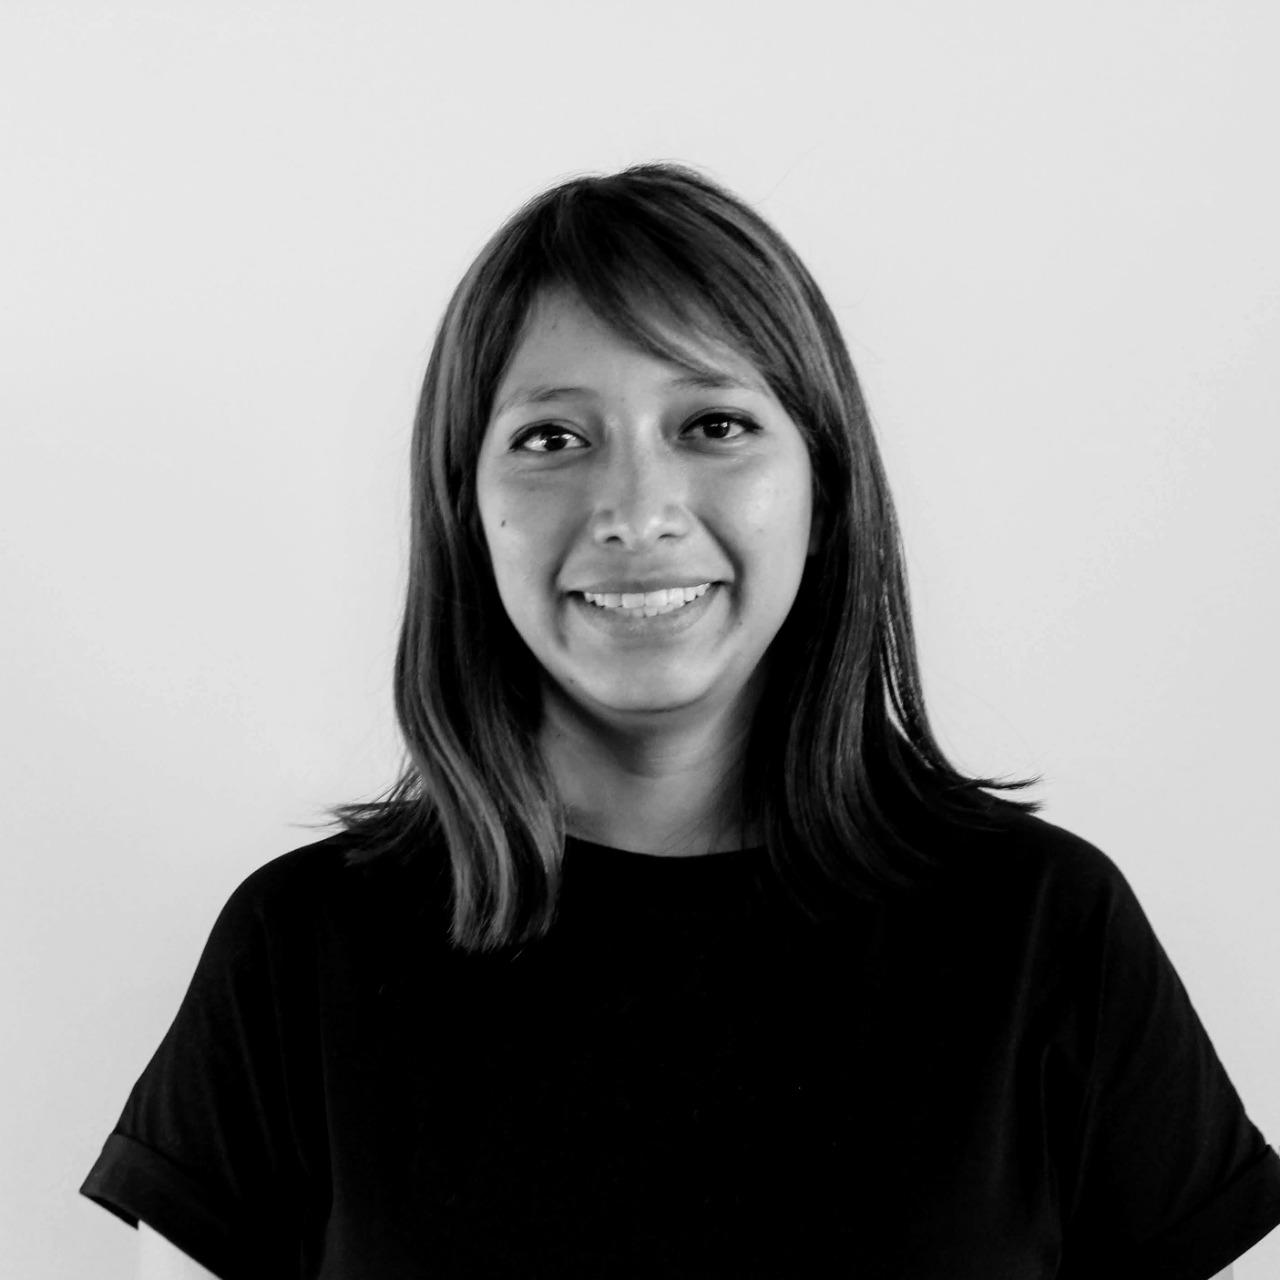 Samantha Guadalupe Cruz Navarro